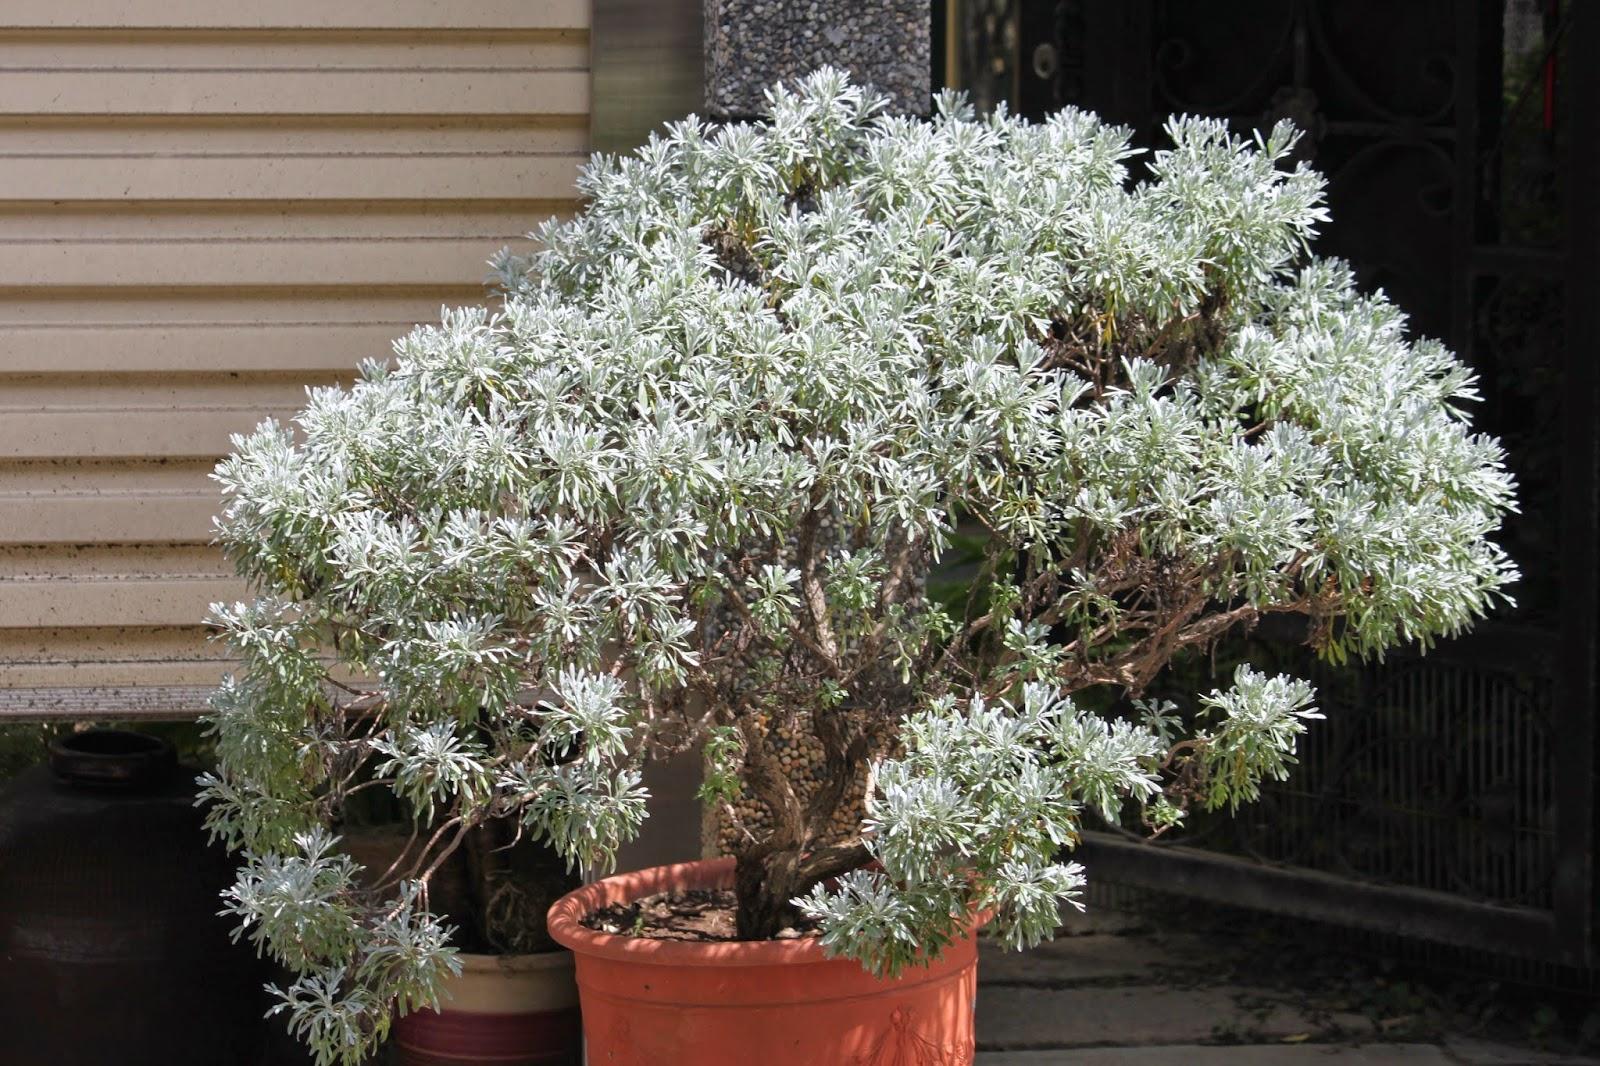 Snow的綠色世界: 來種避邪植物~臺灣芙蓉&日本芙蓉